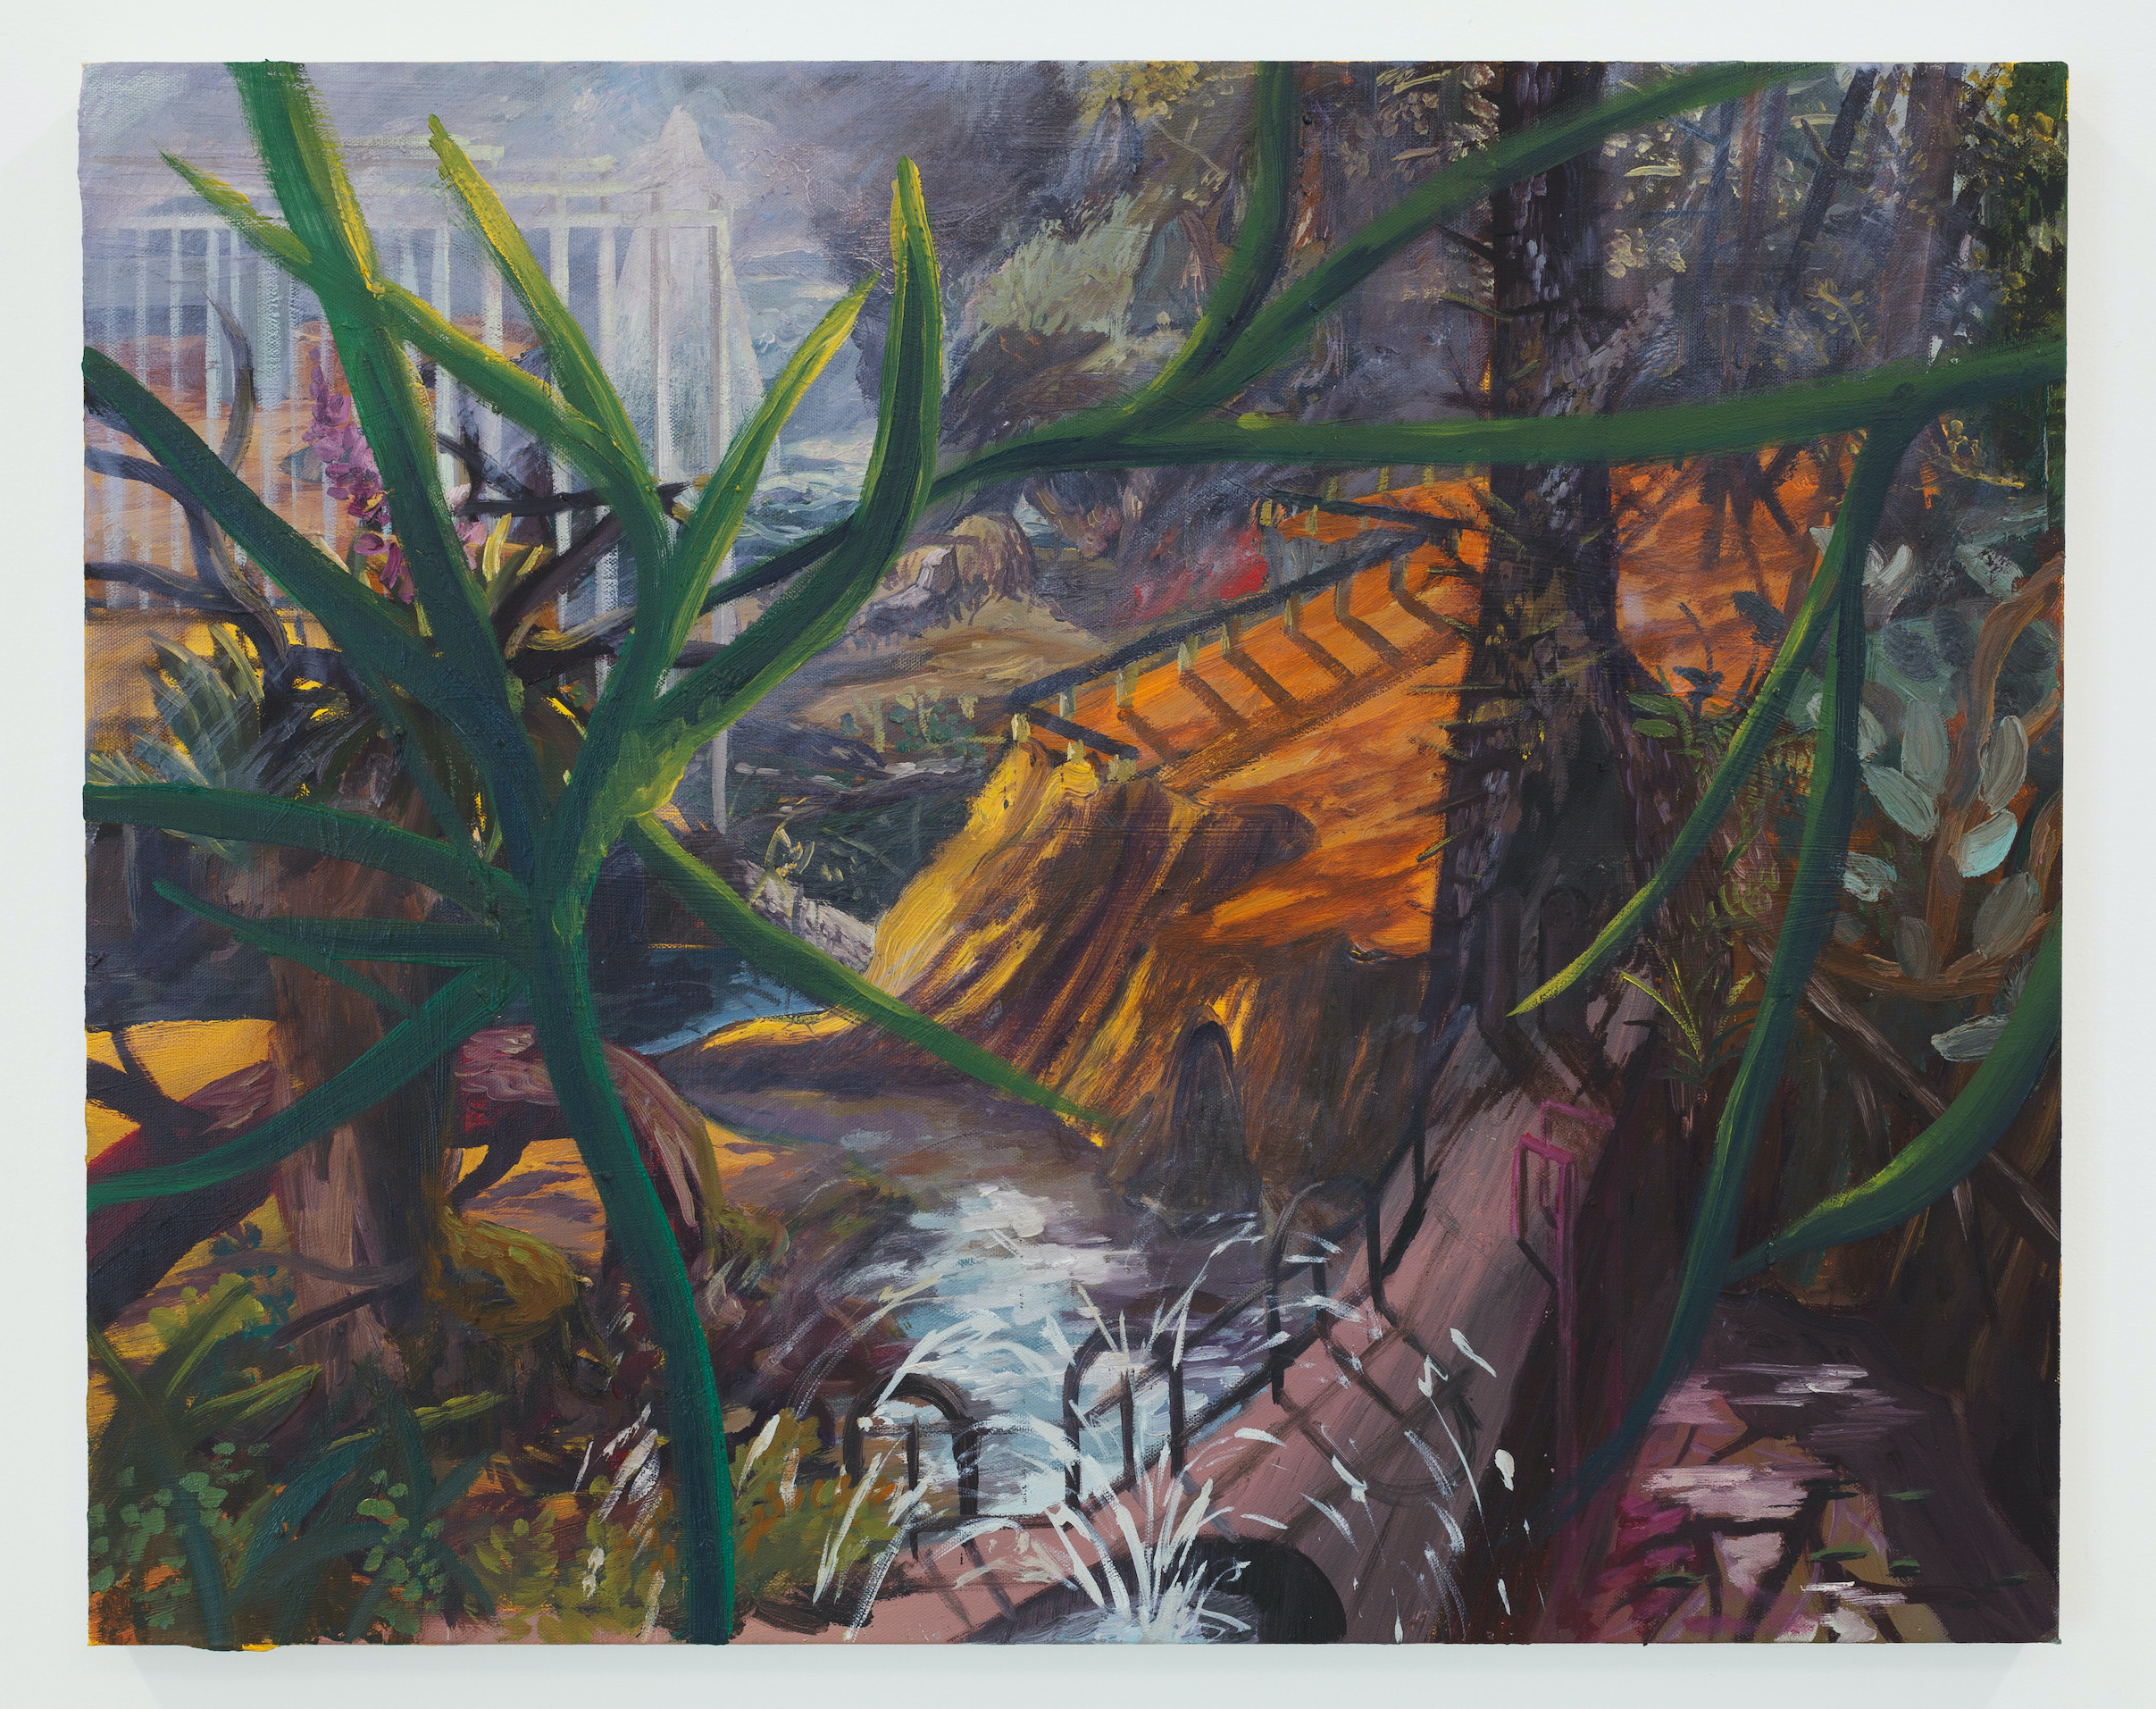 Ernesto Gutierrez Moya, Untitled, 2021